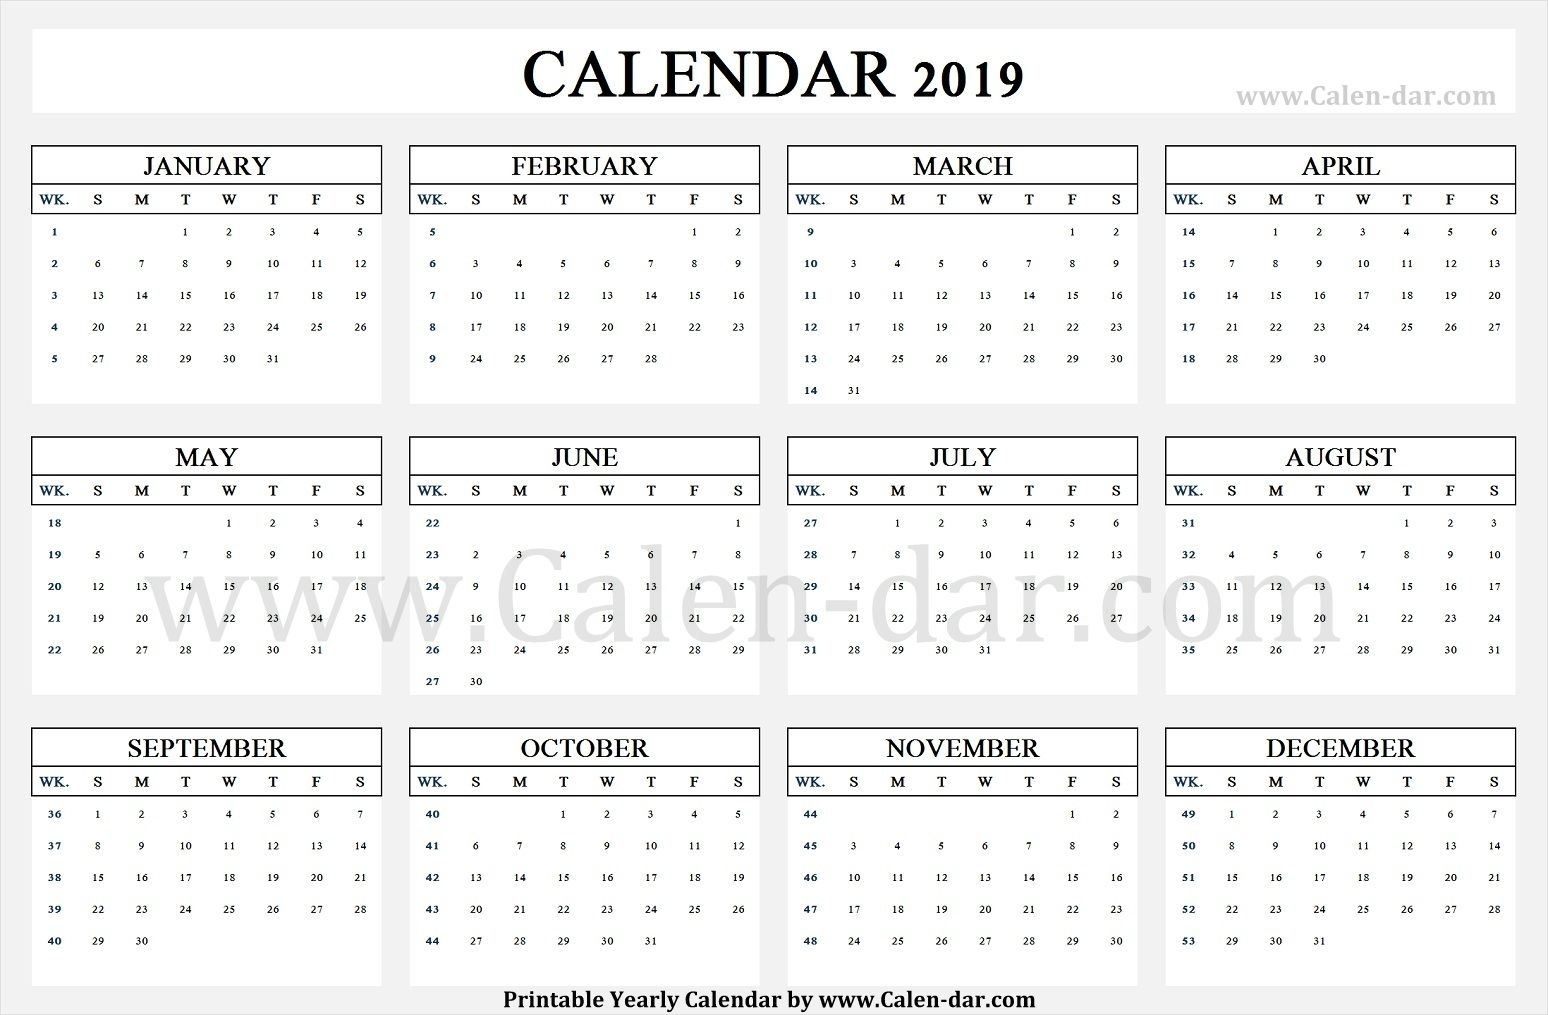 Calendar 2019 Week Wise | Printable Calendar Template